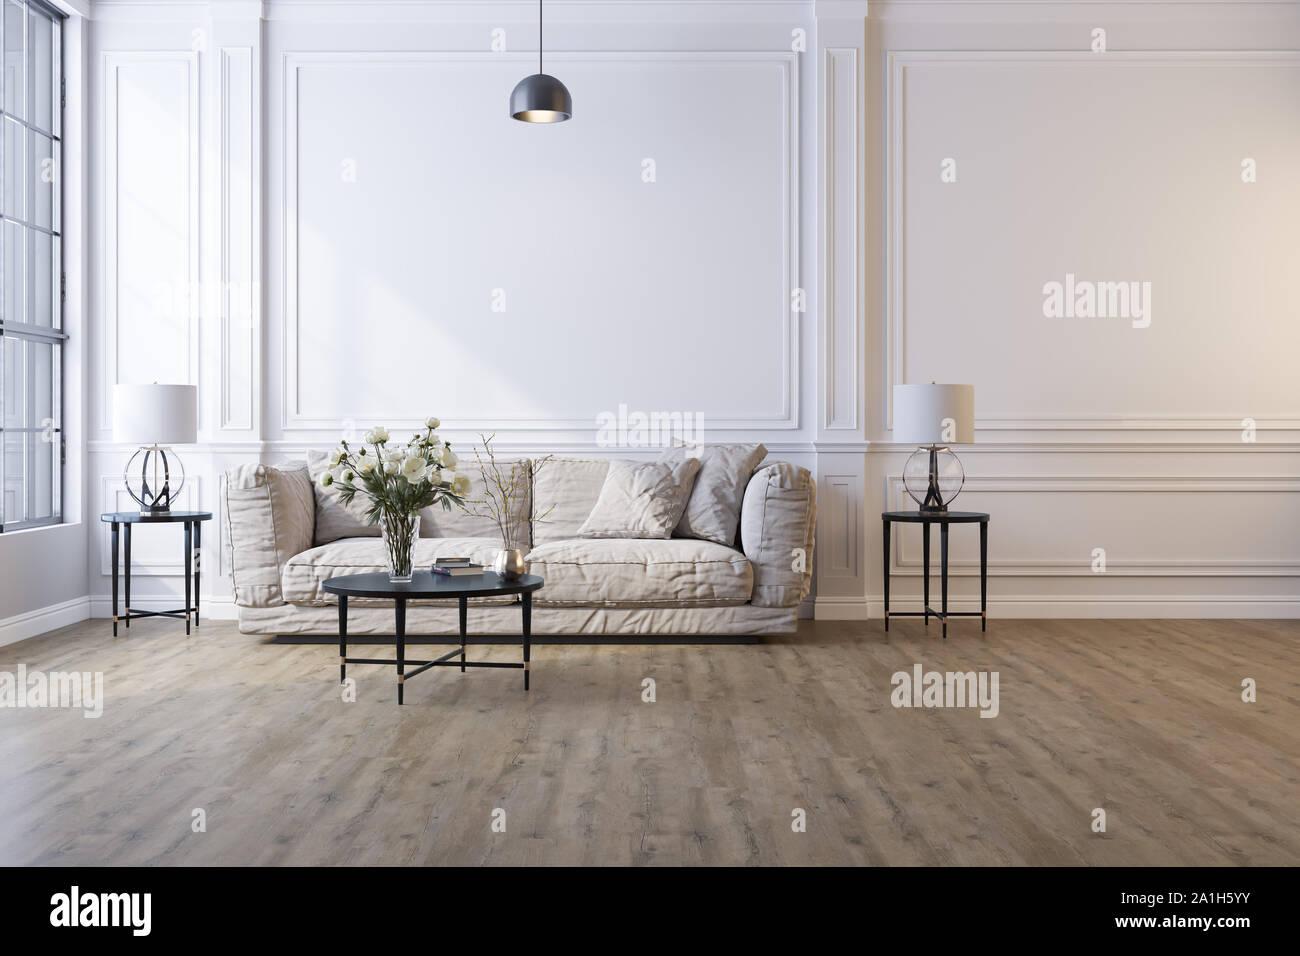 Home Design Et Deco deco lifestyle house stock photos & deco lifestyle house